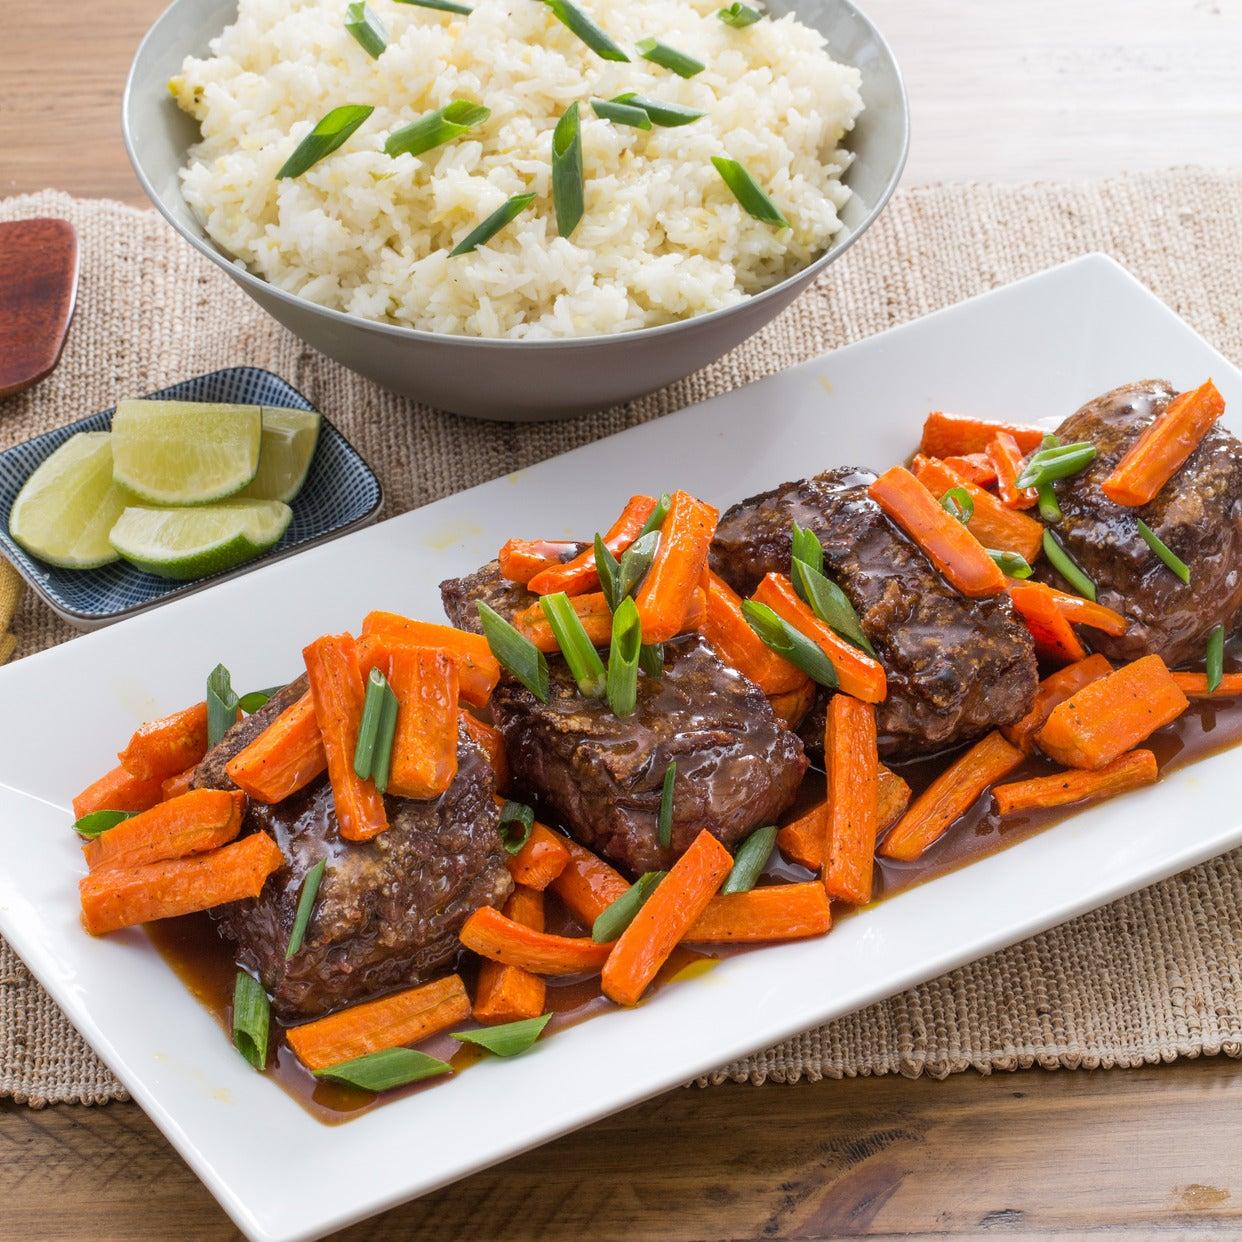 Hoisin & Ponzu-Glazed Steaks with Roasted Carrots & Garlic-Ginger Rice